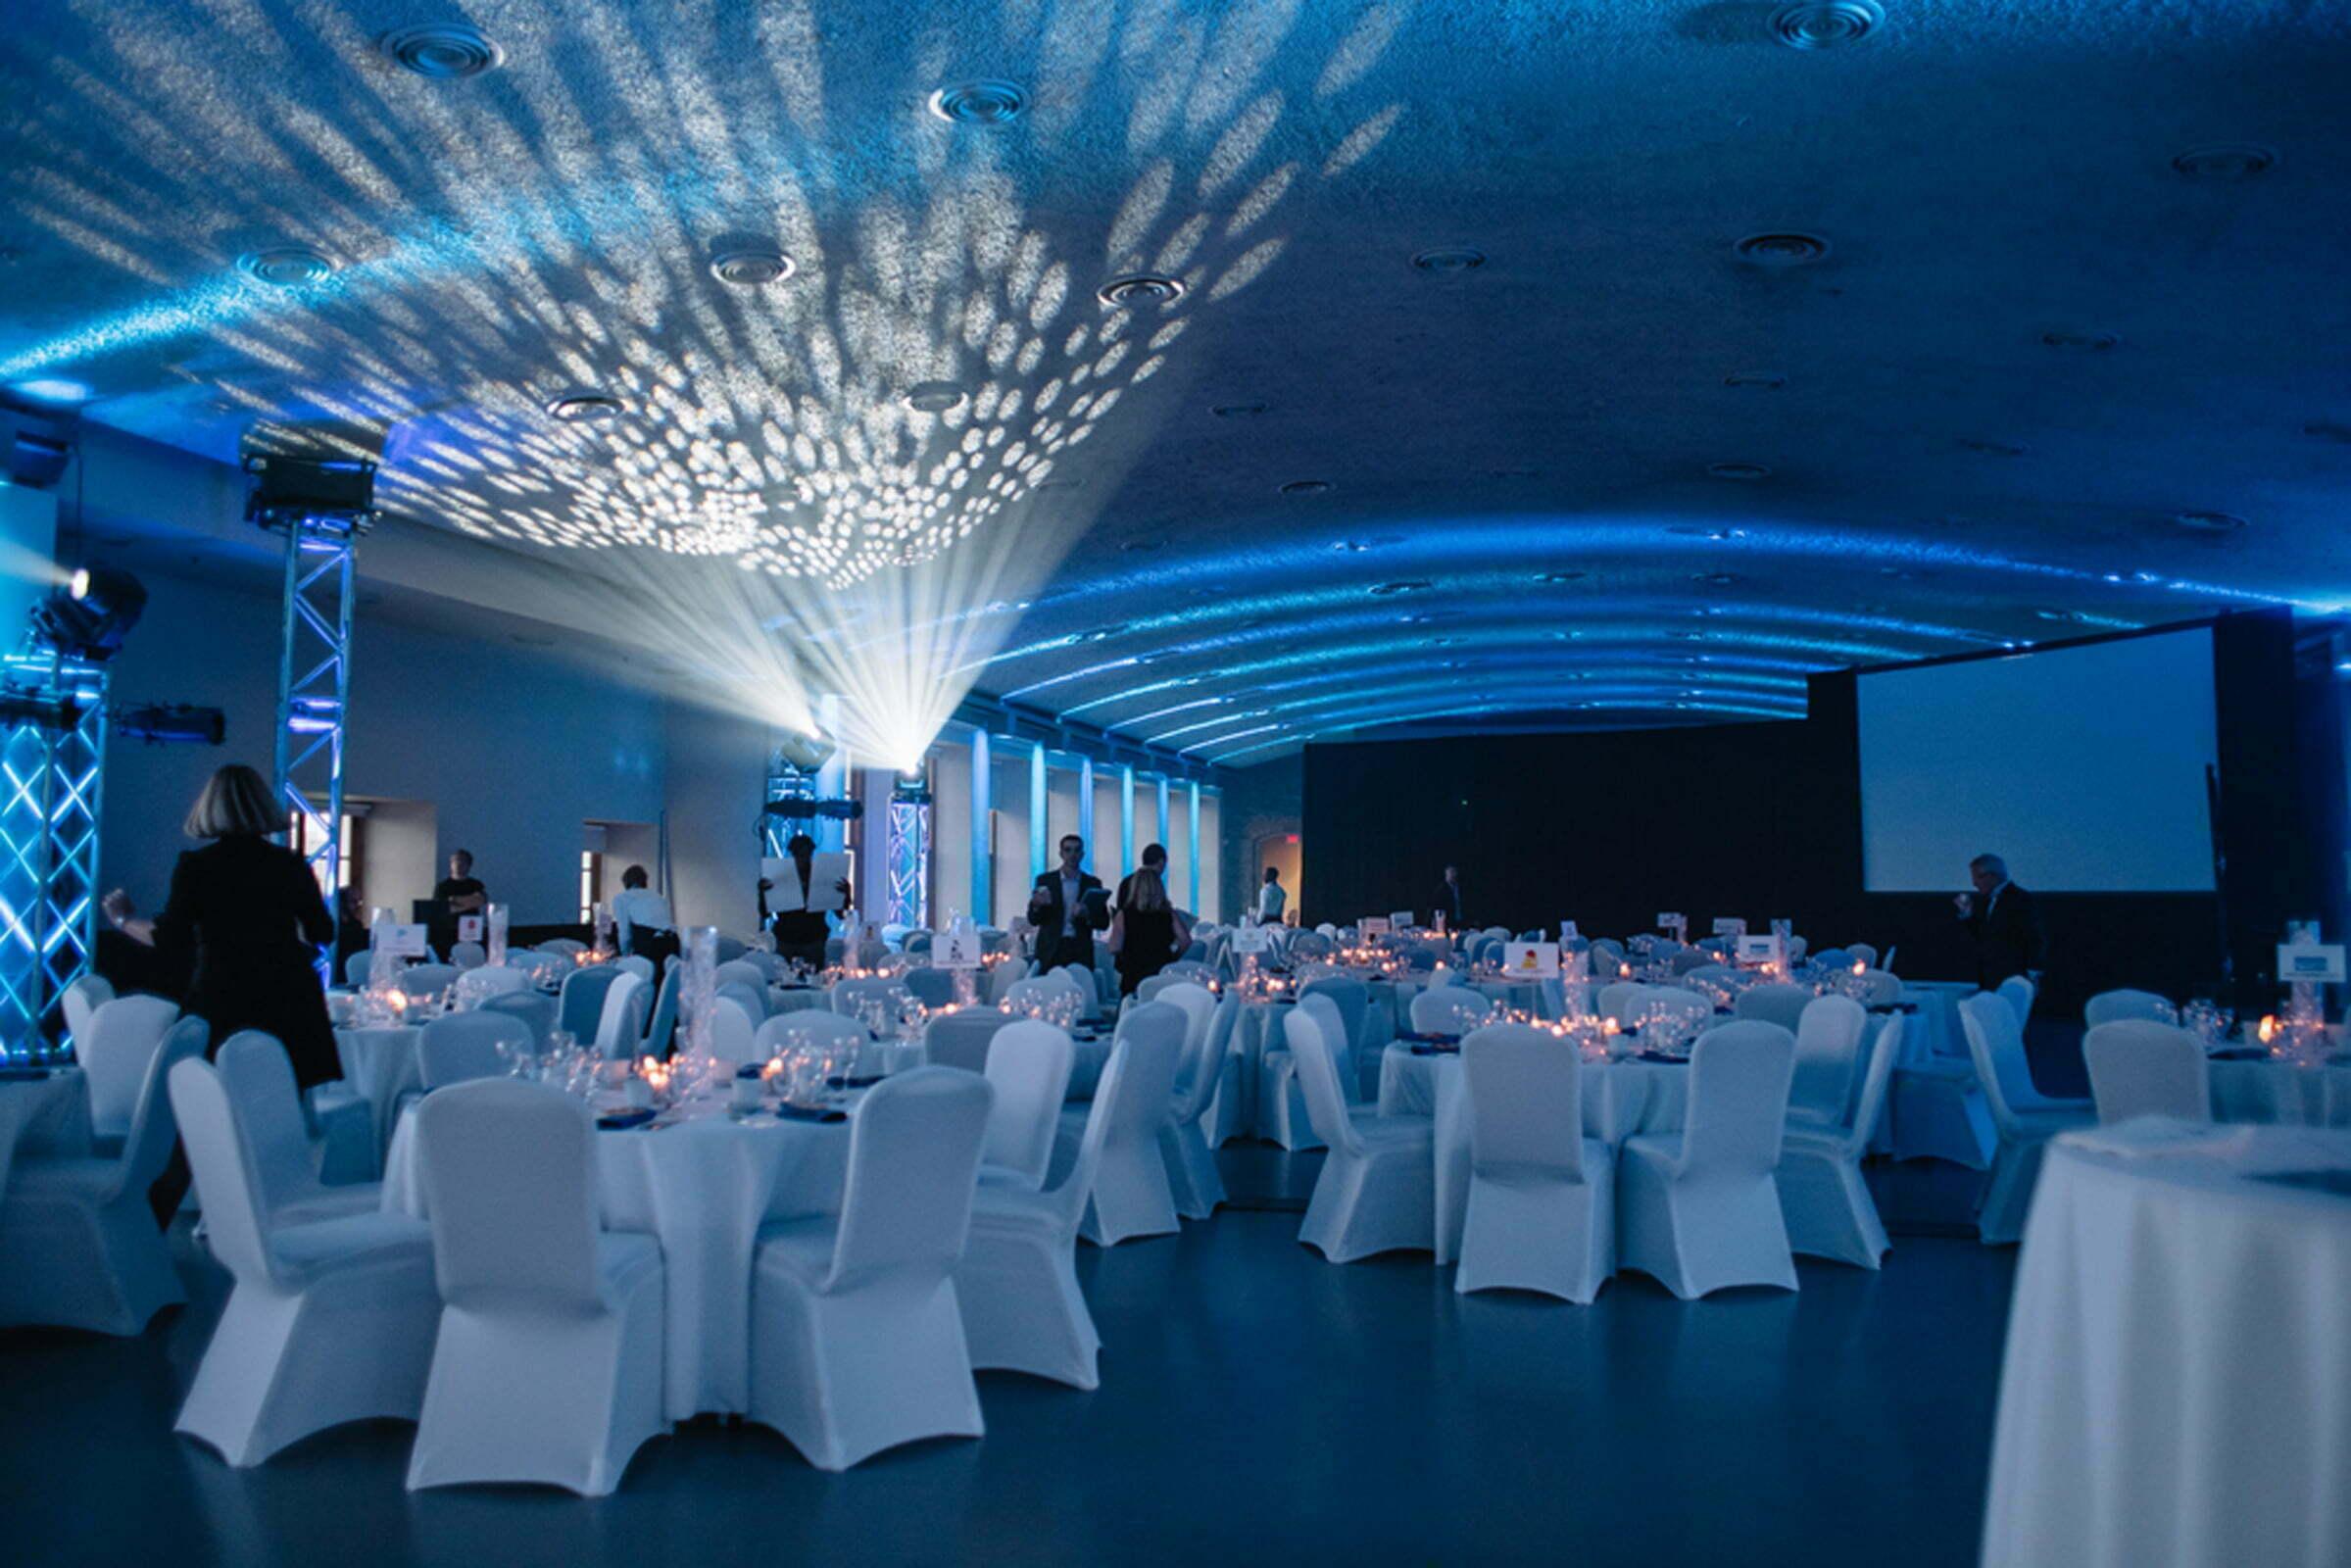 Gala venue